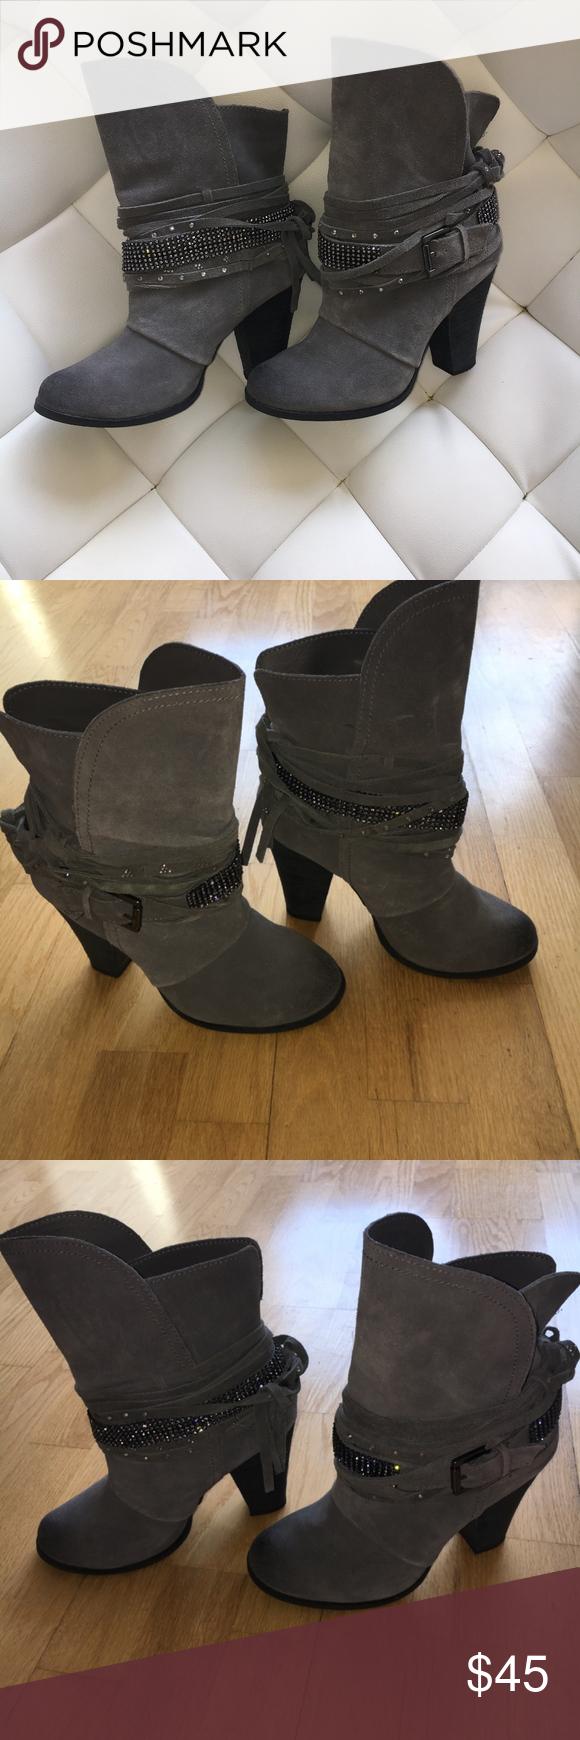 Gray Western style rhinestone boots